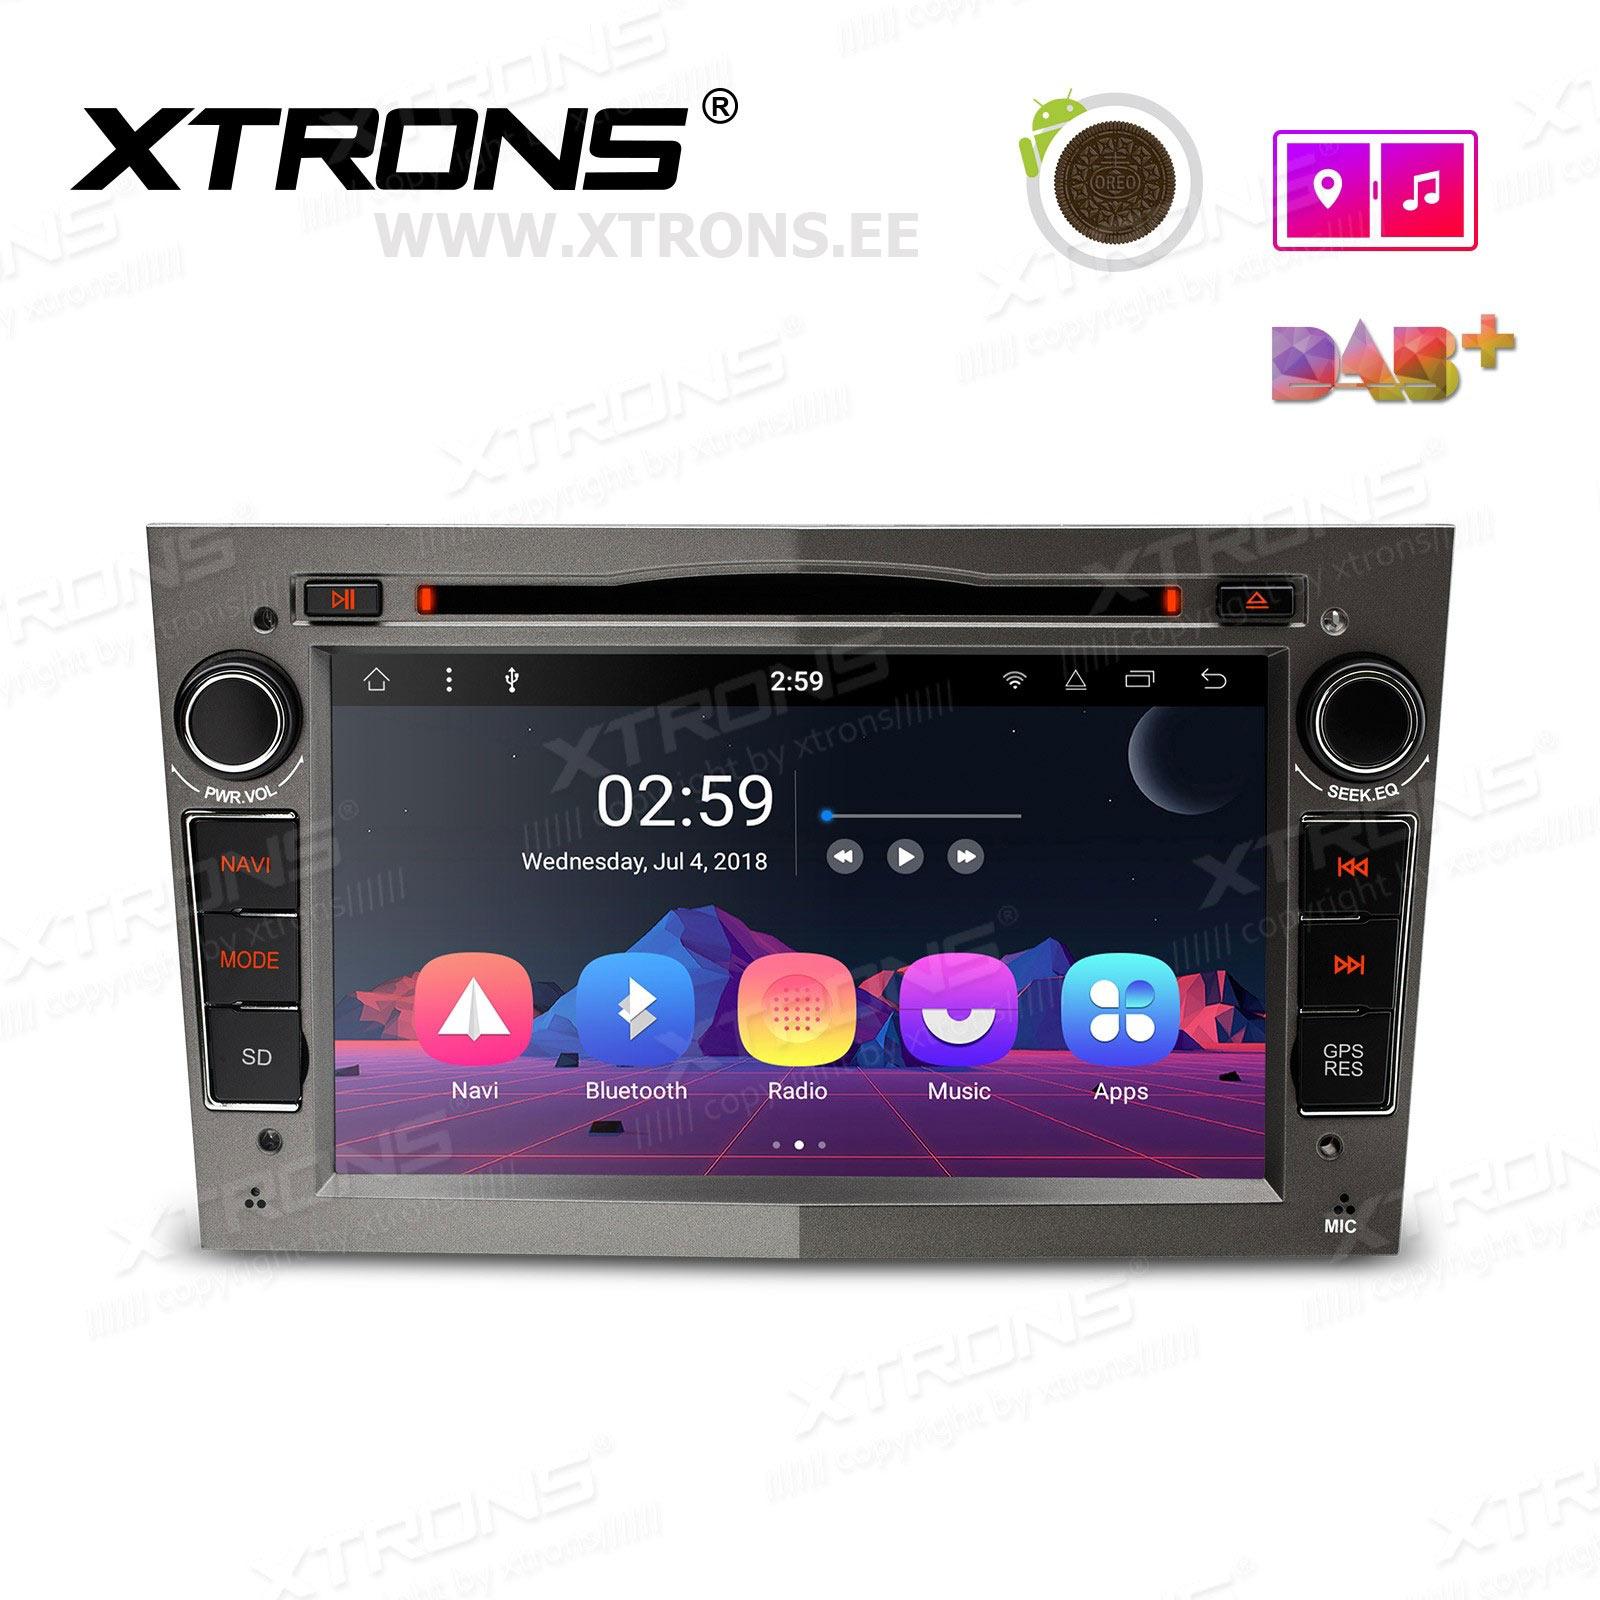 XTRONS PR78OLO-B